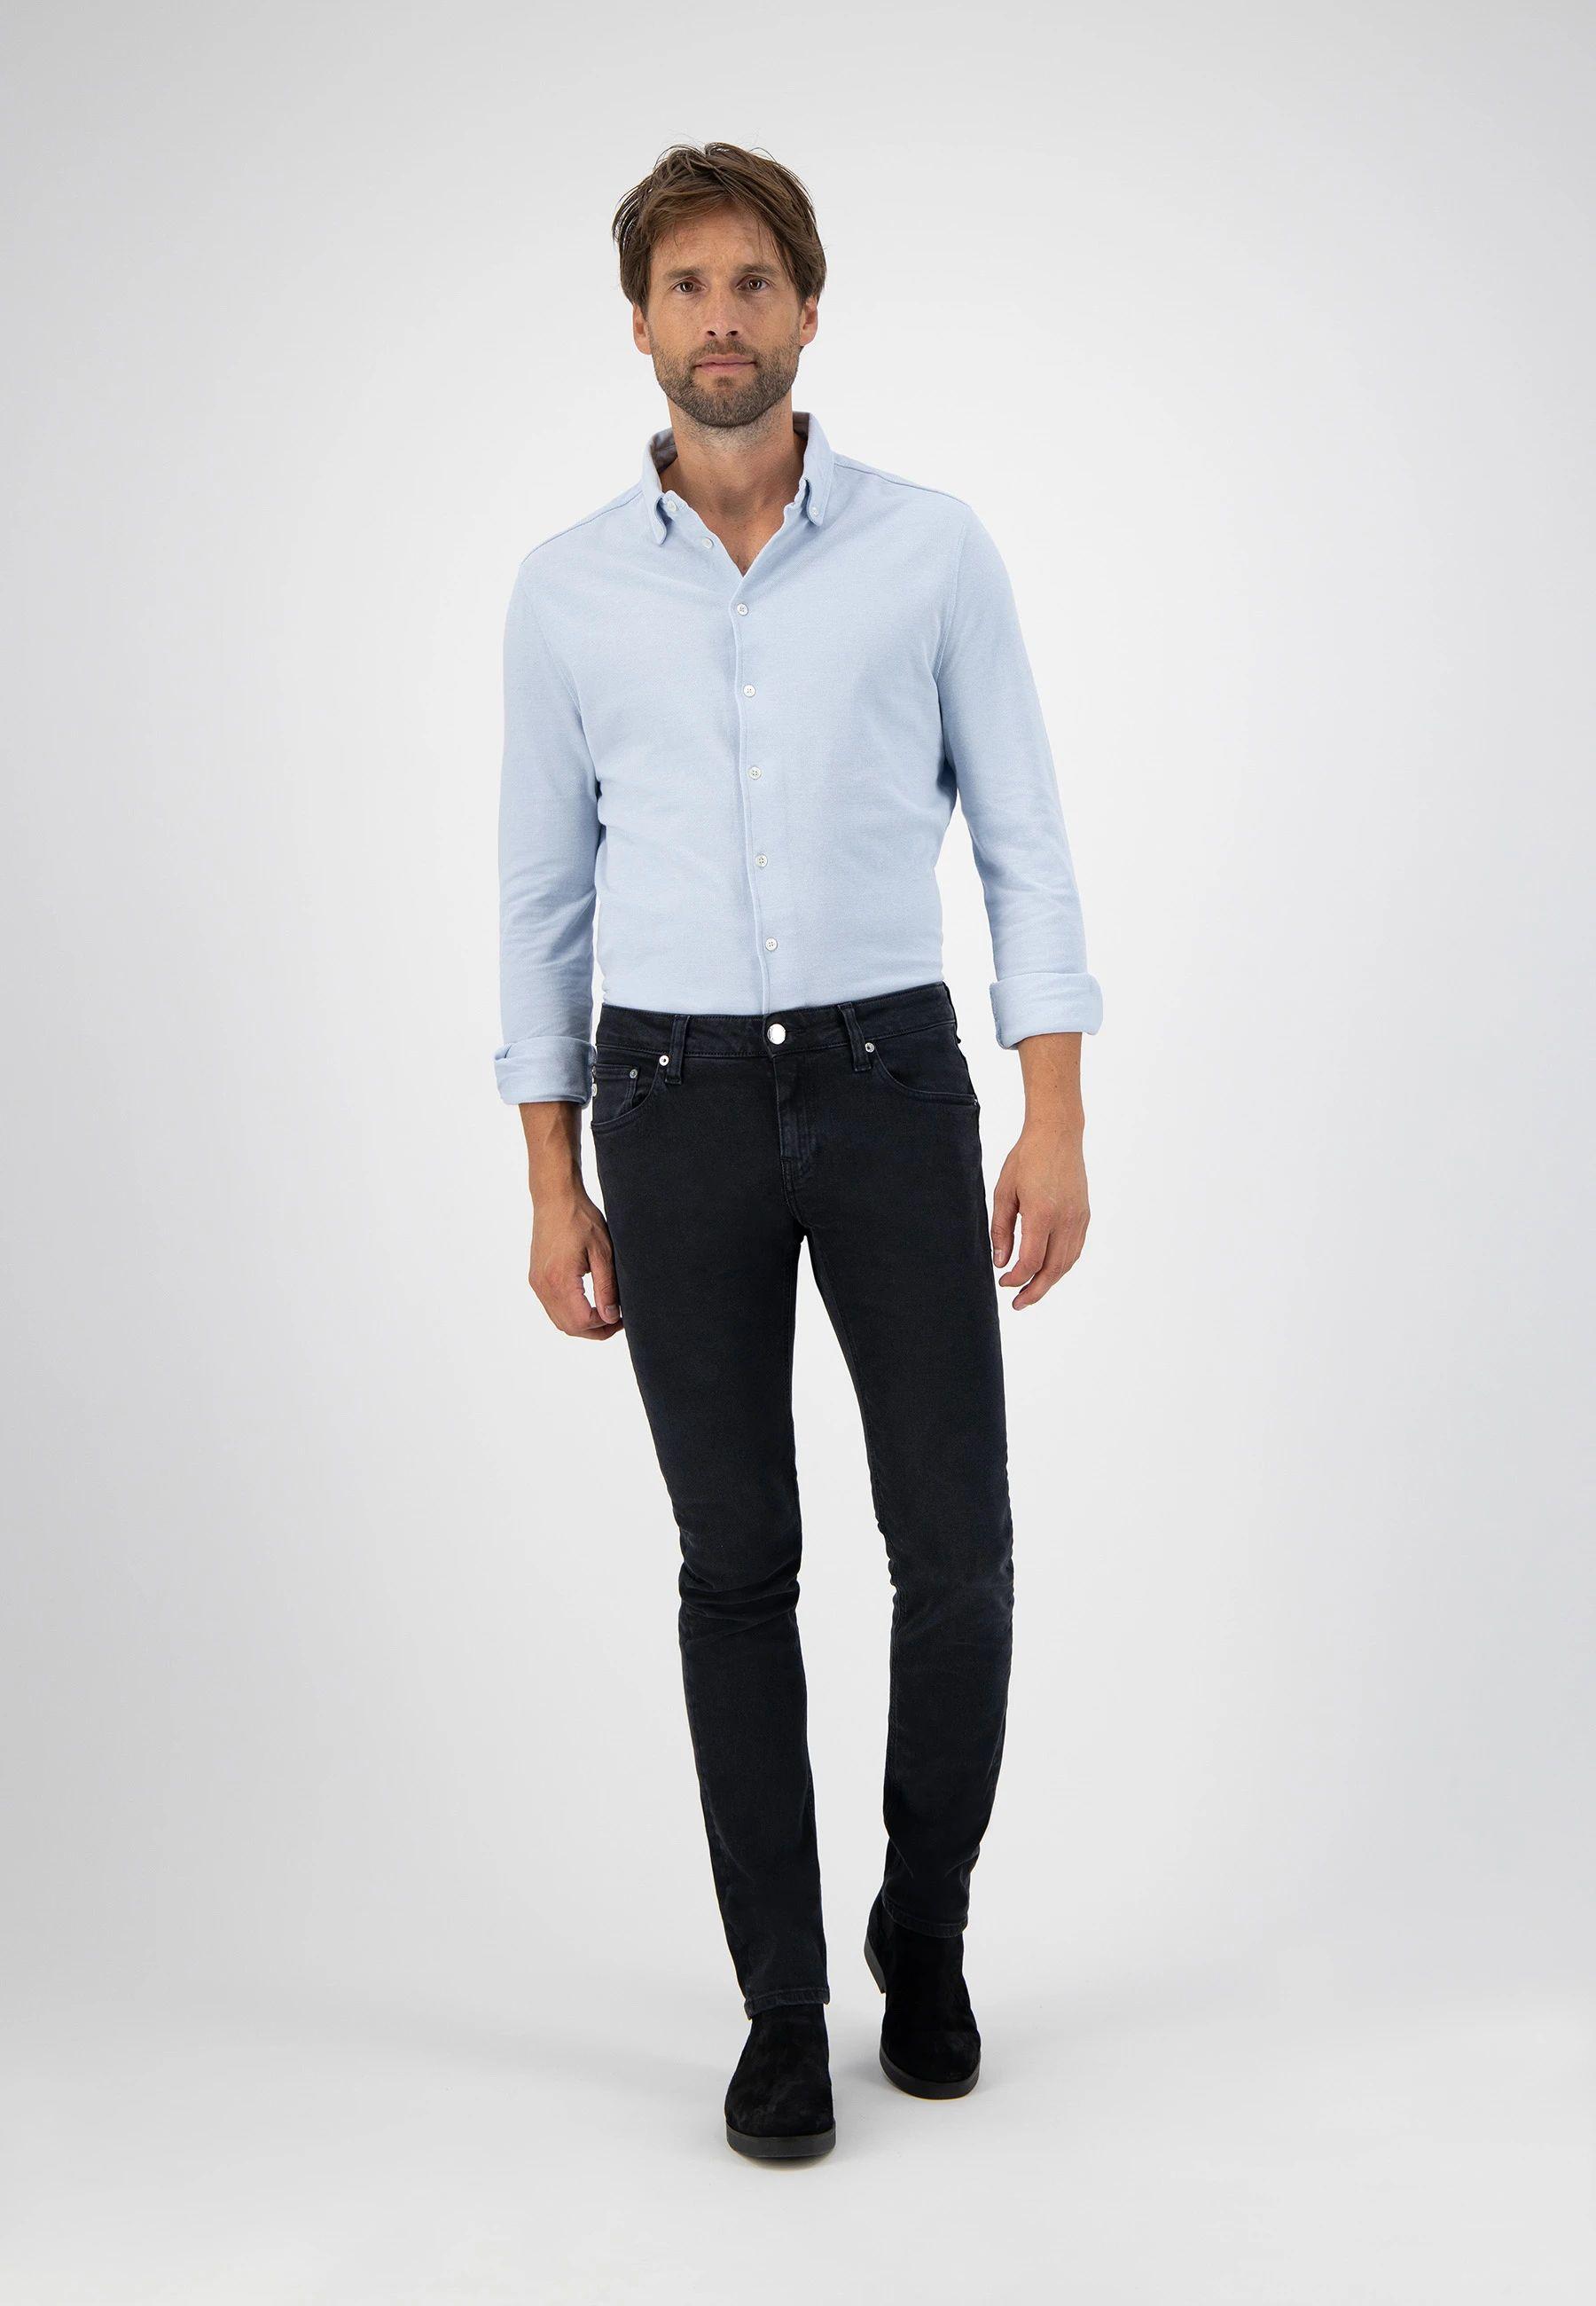 Men-Eco-Jeans-Slim-Lassen-Stone-Black-Fullfront_2000x